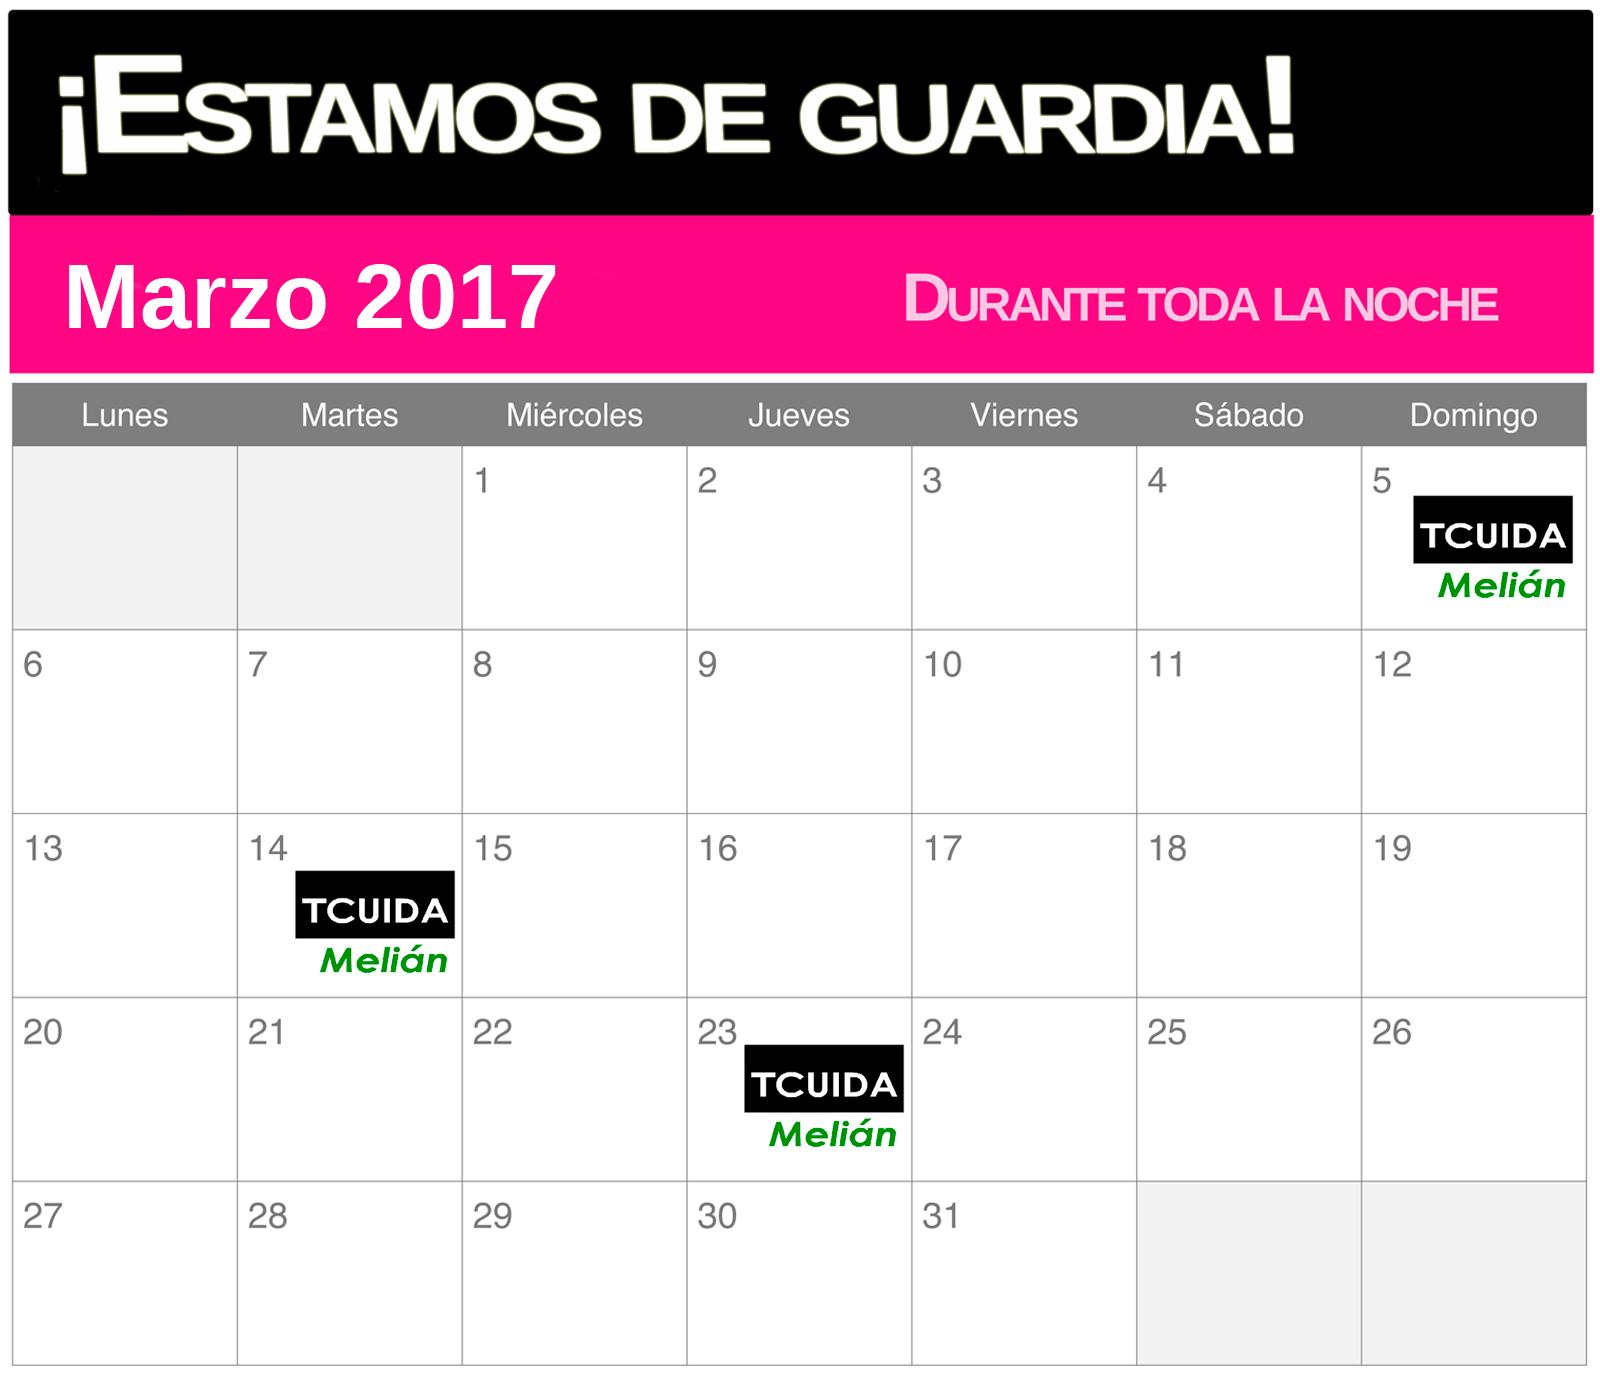 Tcuida-melian-guardias-marzo